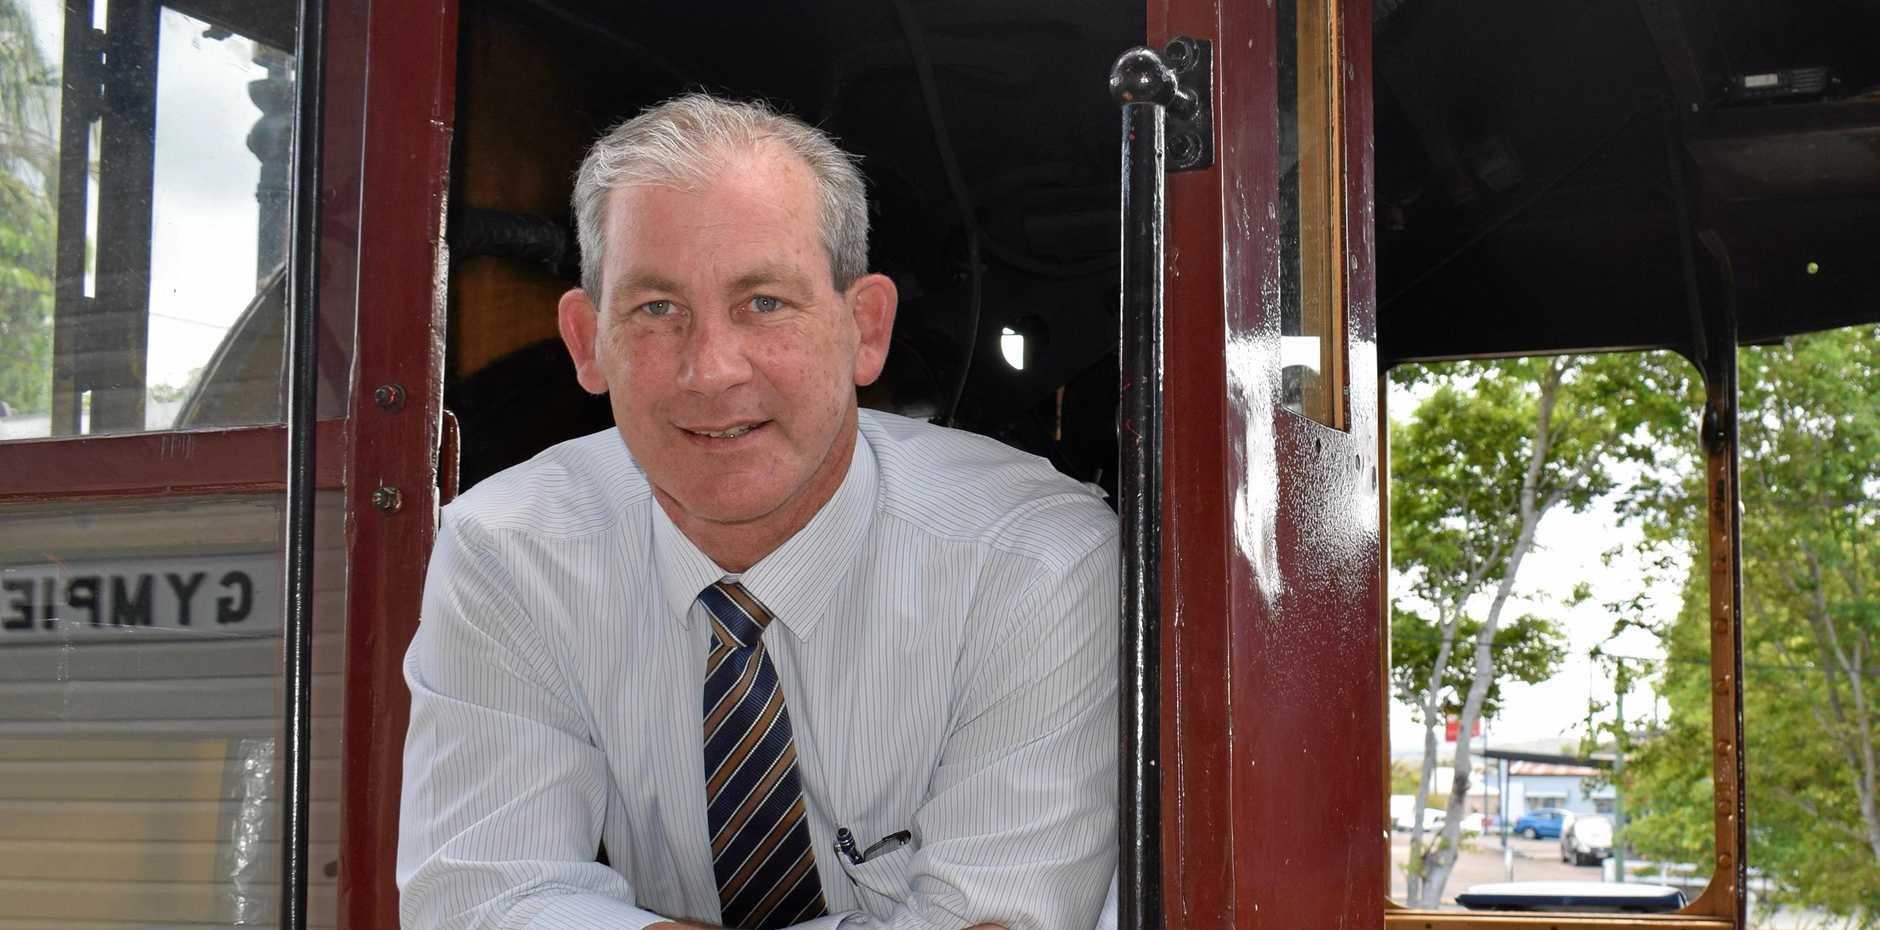 Mayor Mick Curran